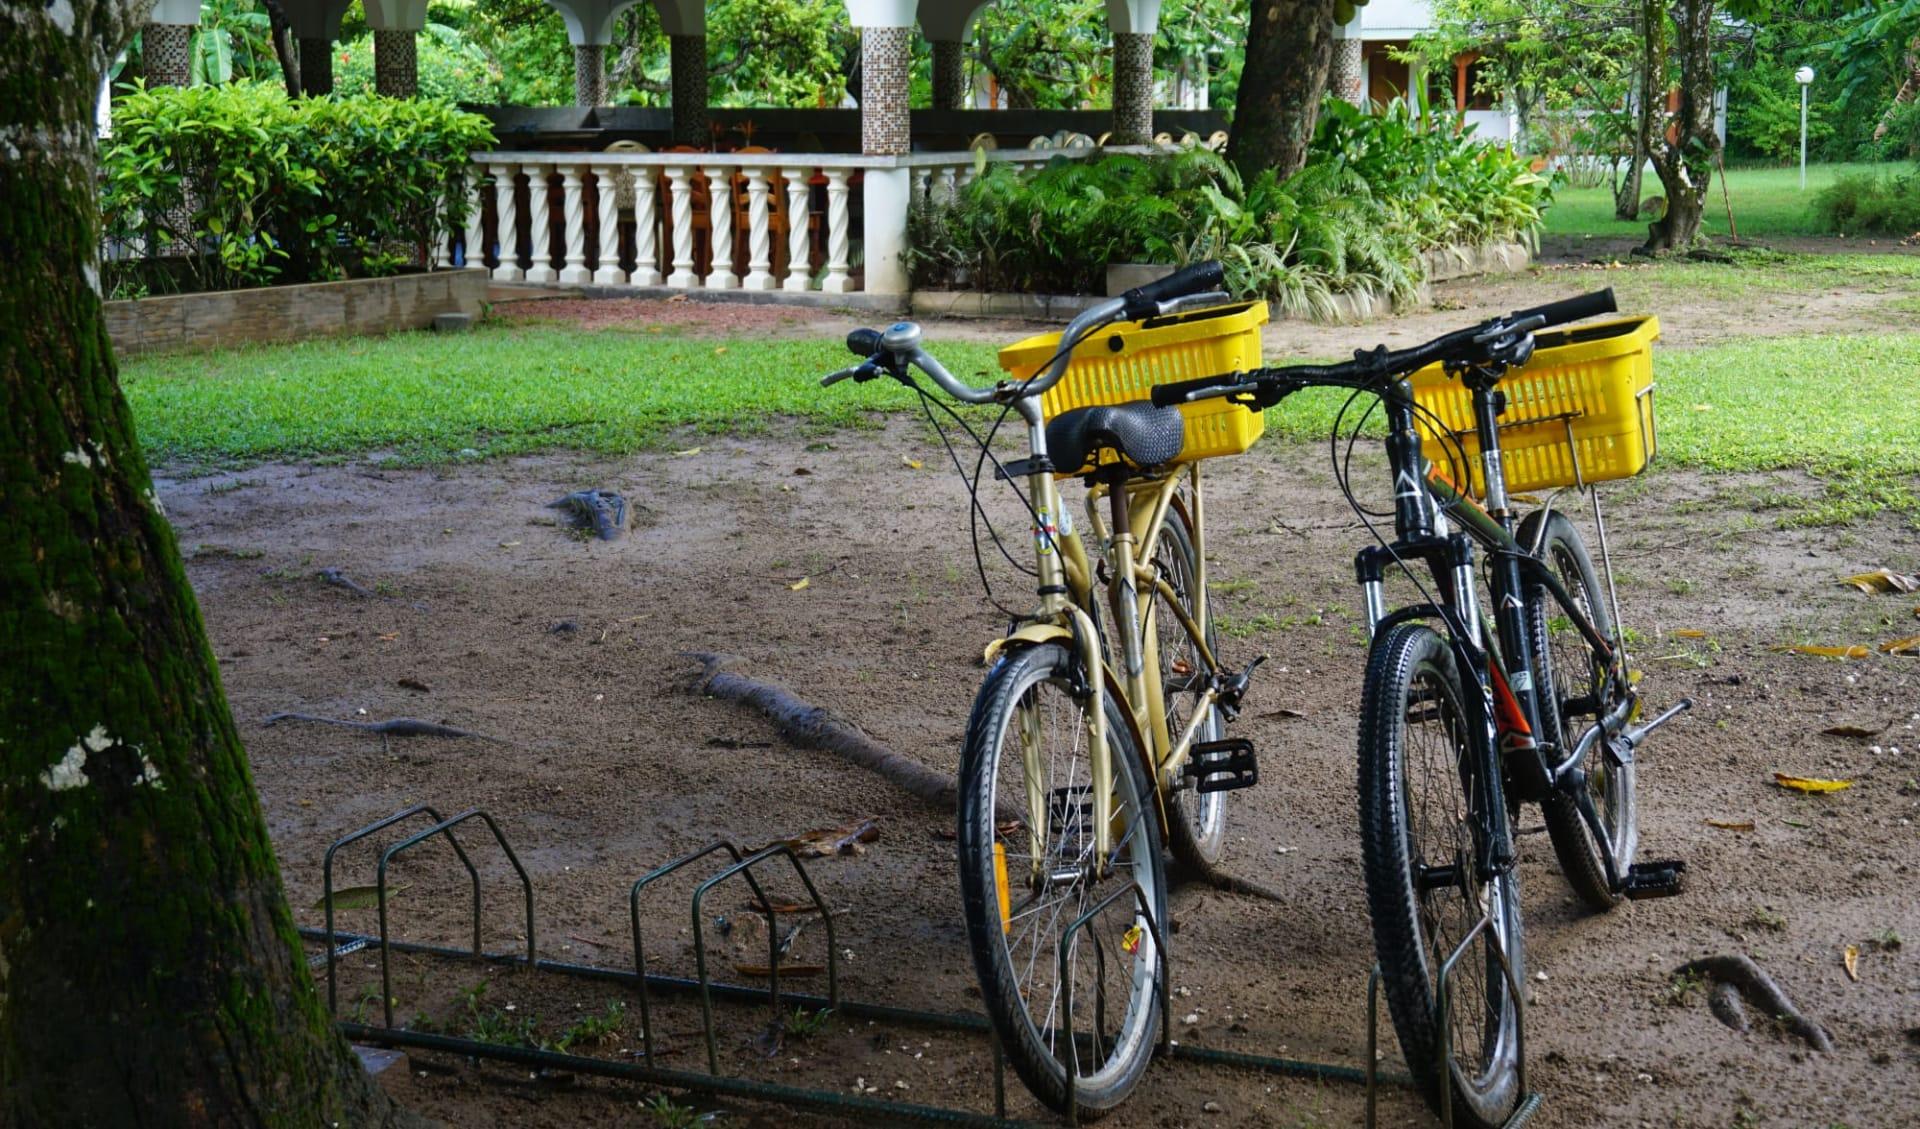 Chalet Bamboo Vert in La Digue:  bikes chalet Bamboo vert